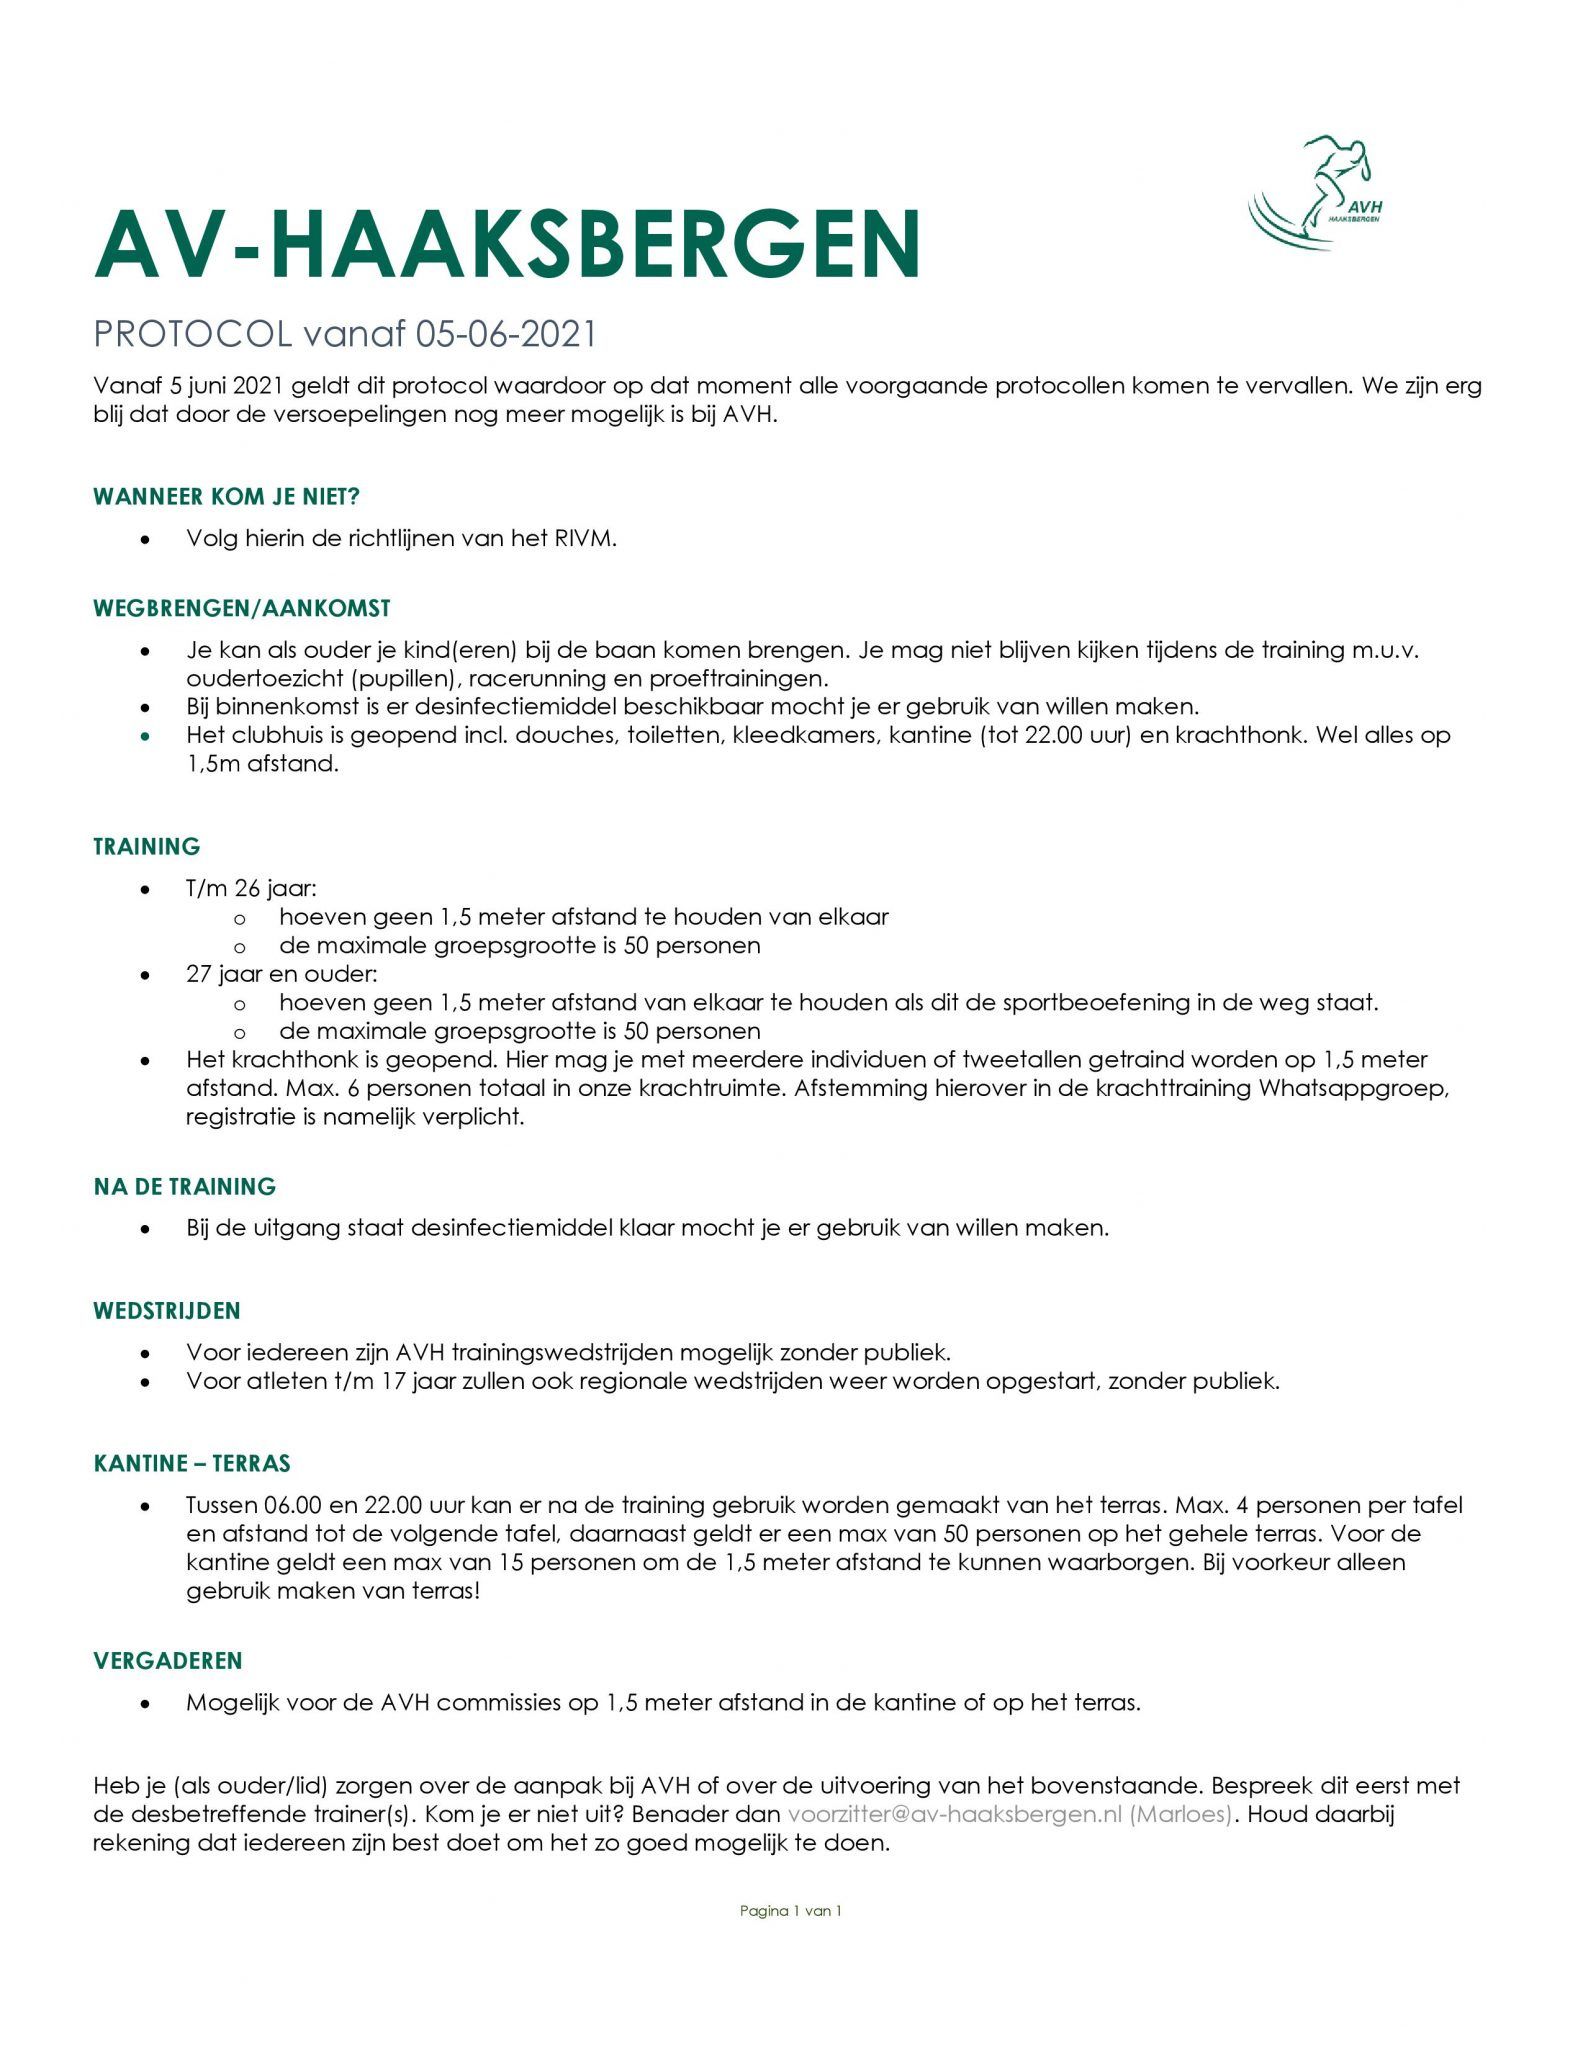 AVH Corona protocol per 5 juni 2021.